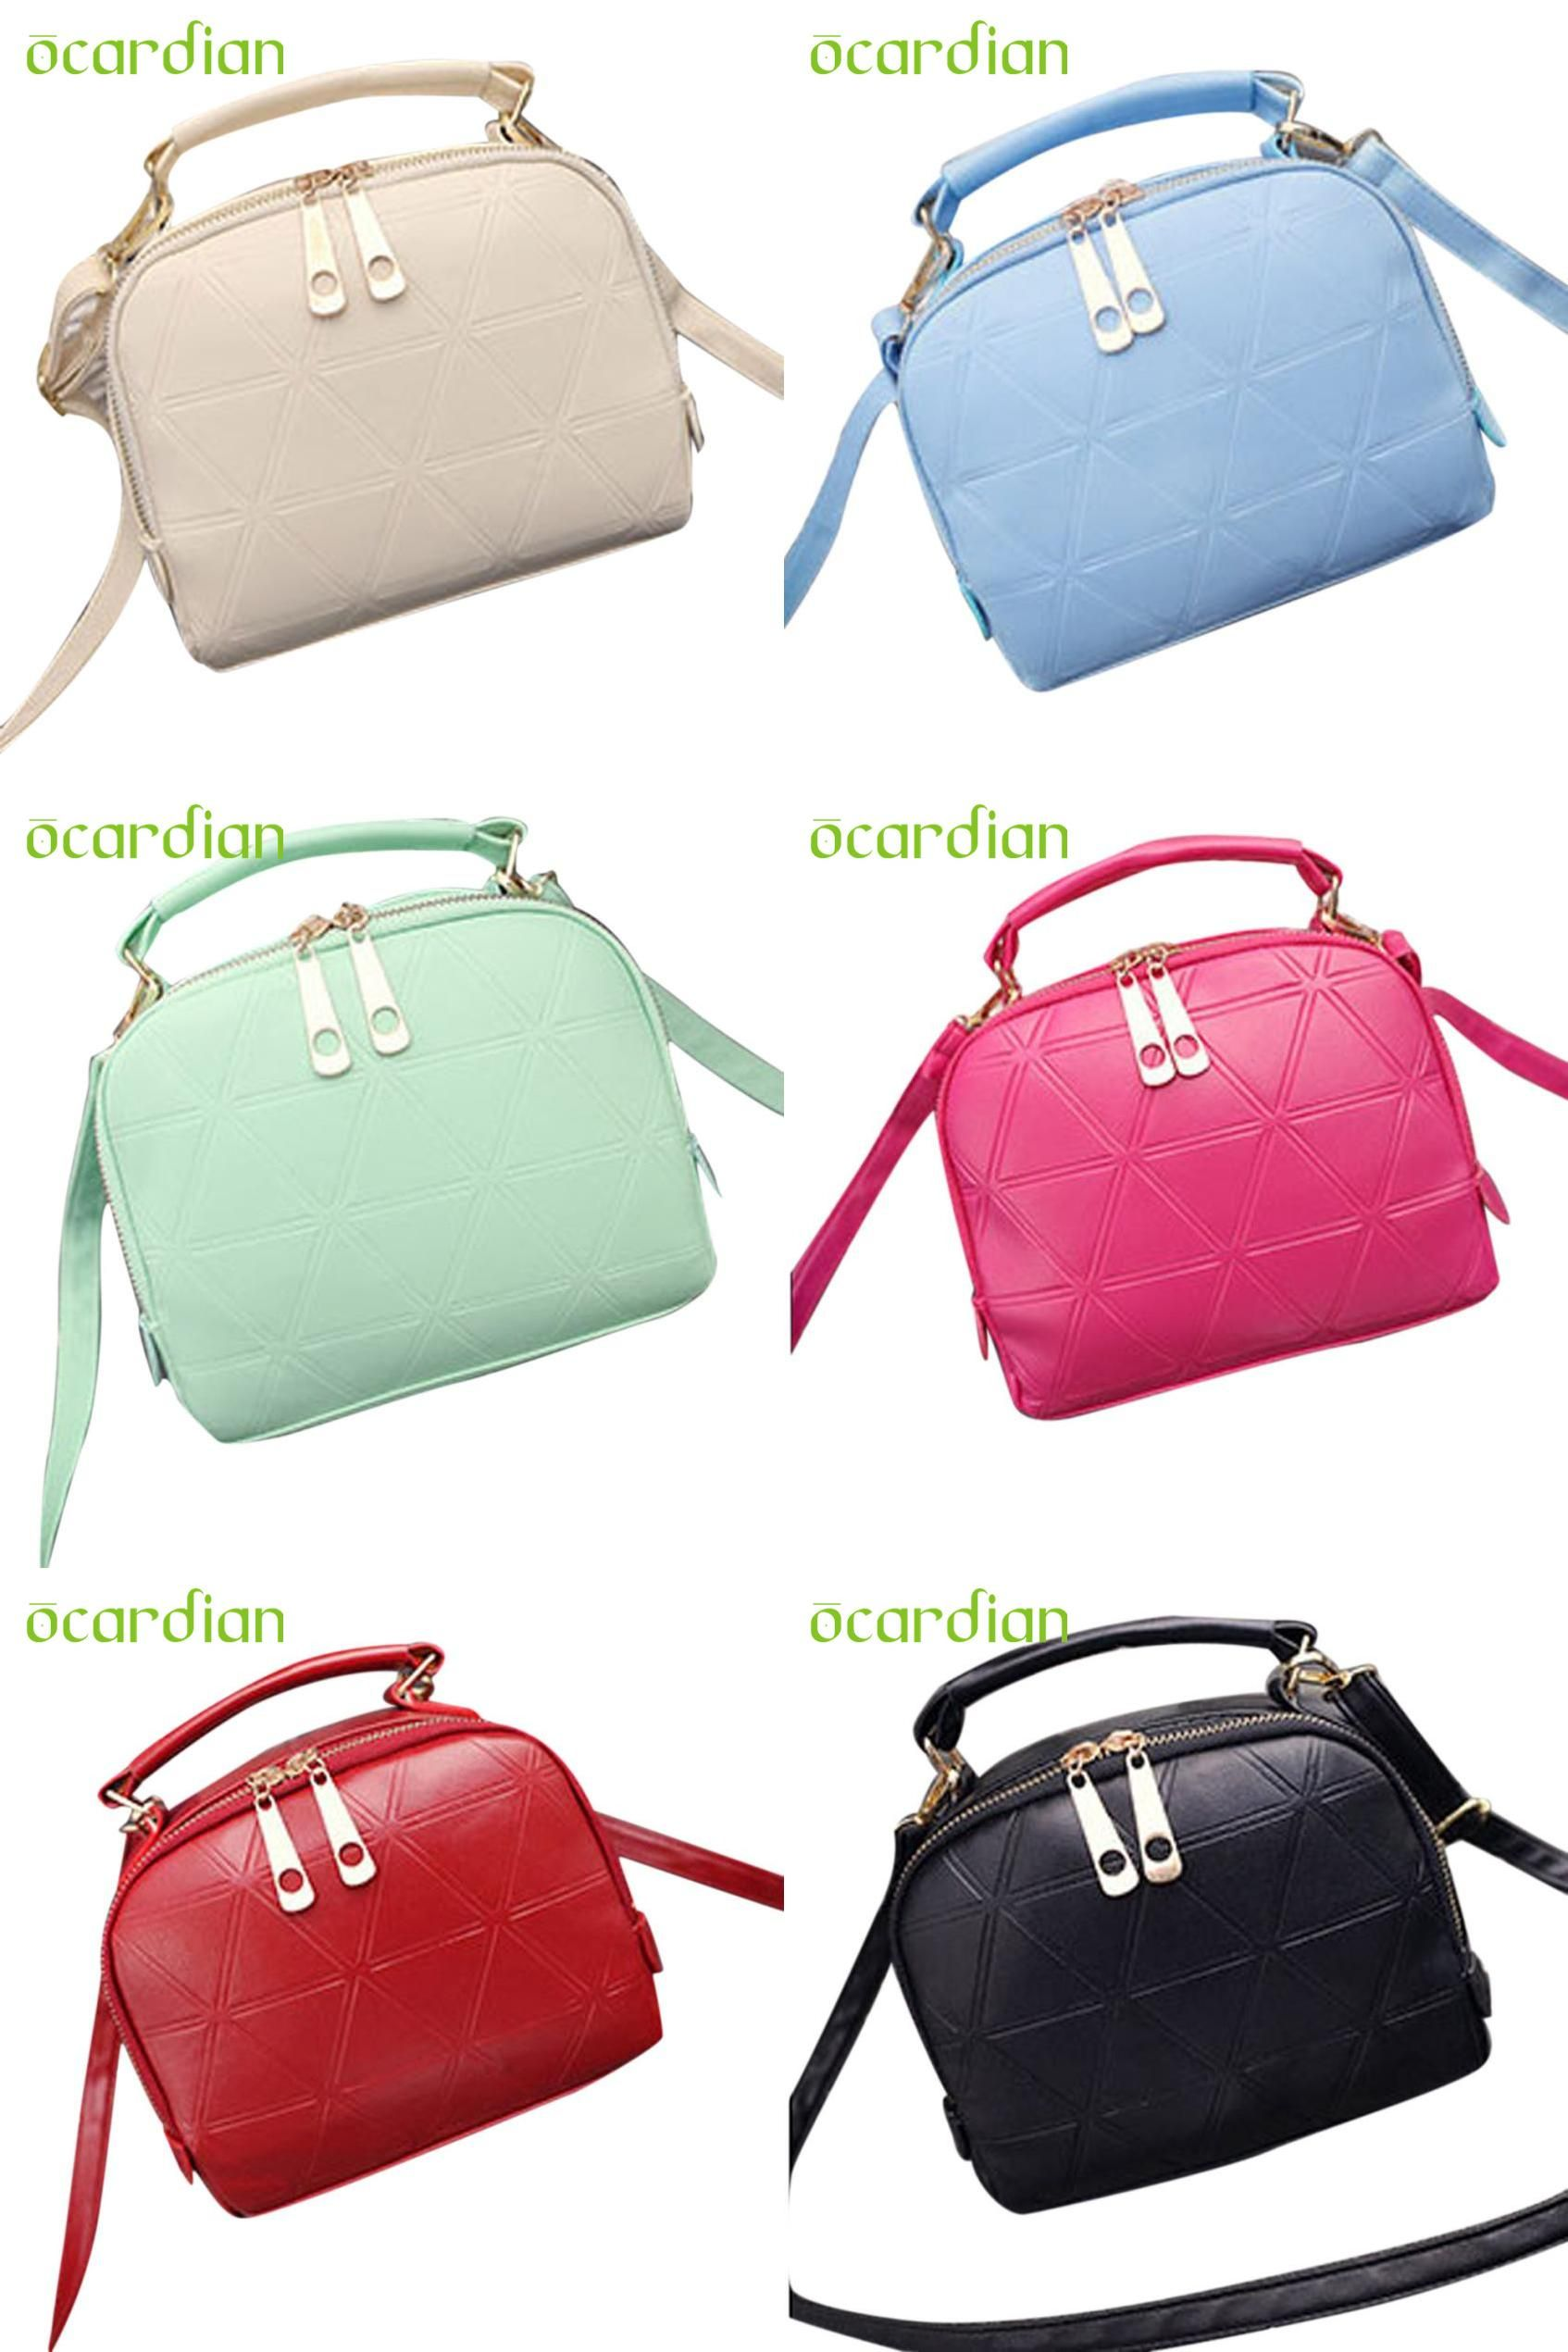 Visit To Ocardian Elegance Hot Fashion Handbag Shoulder Bag Lady Tote Purse Pu